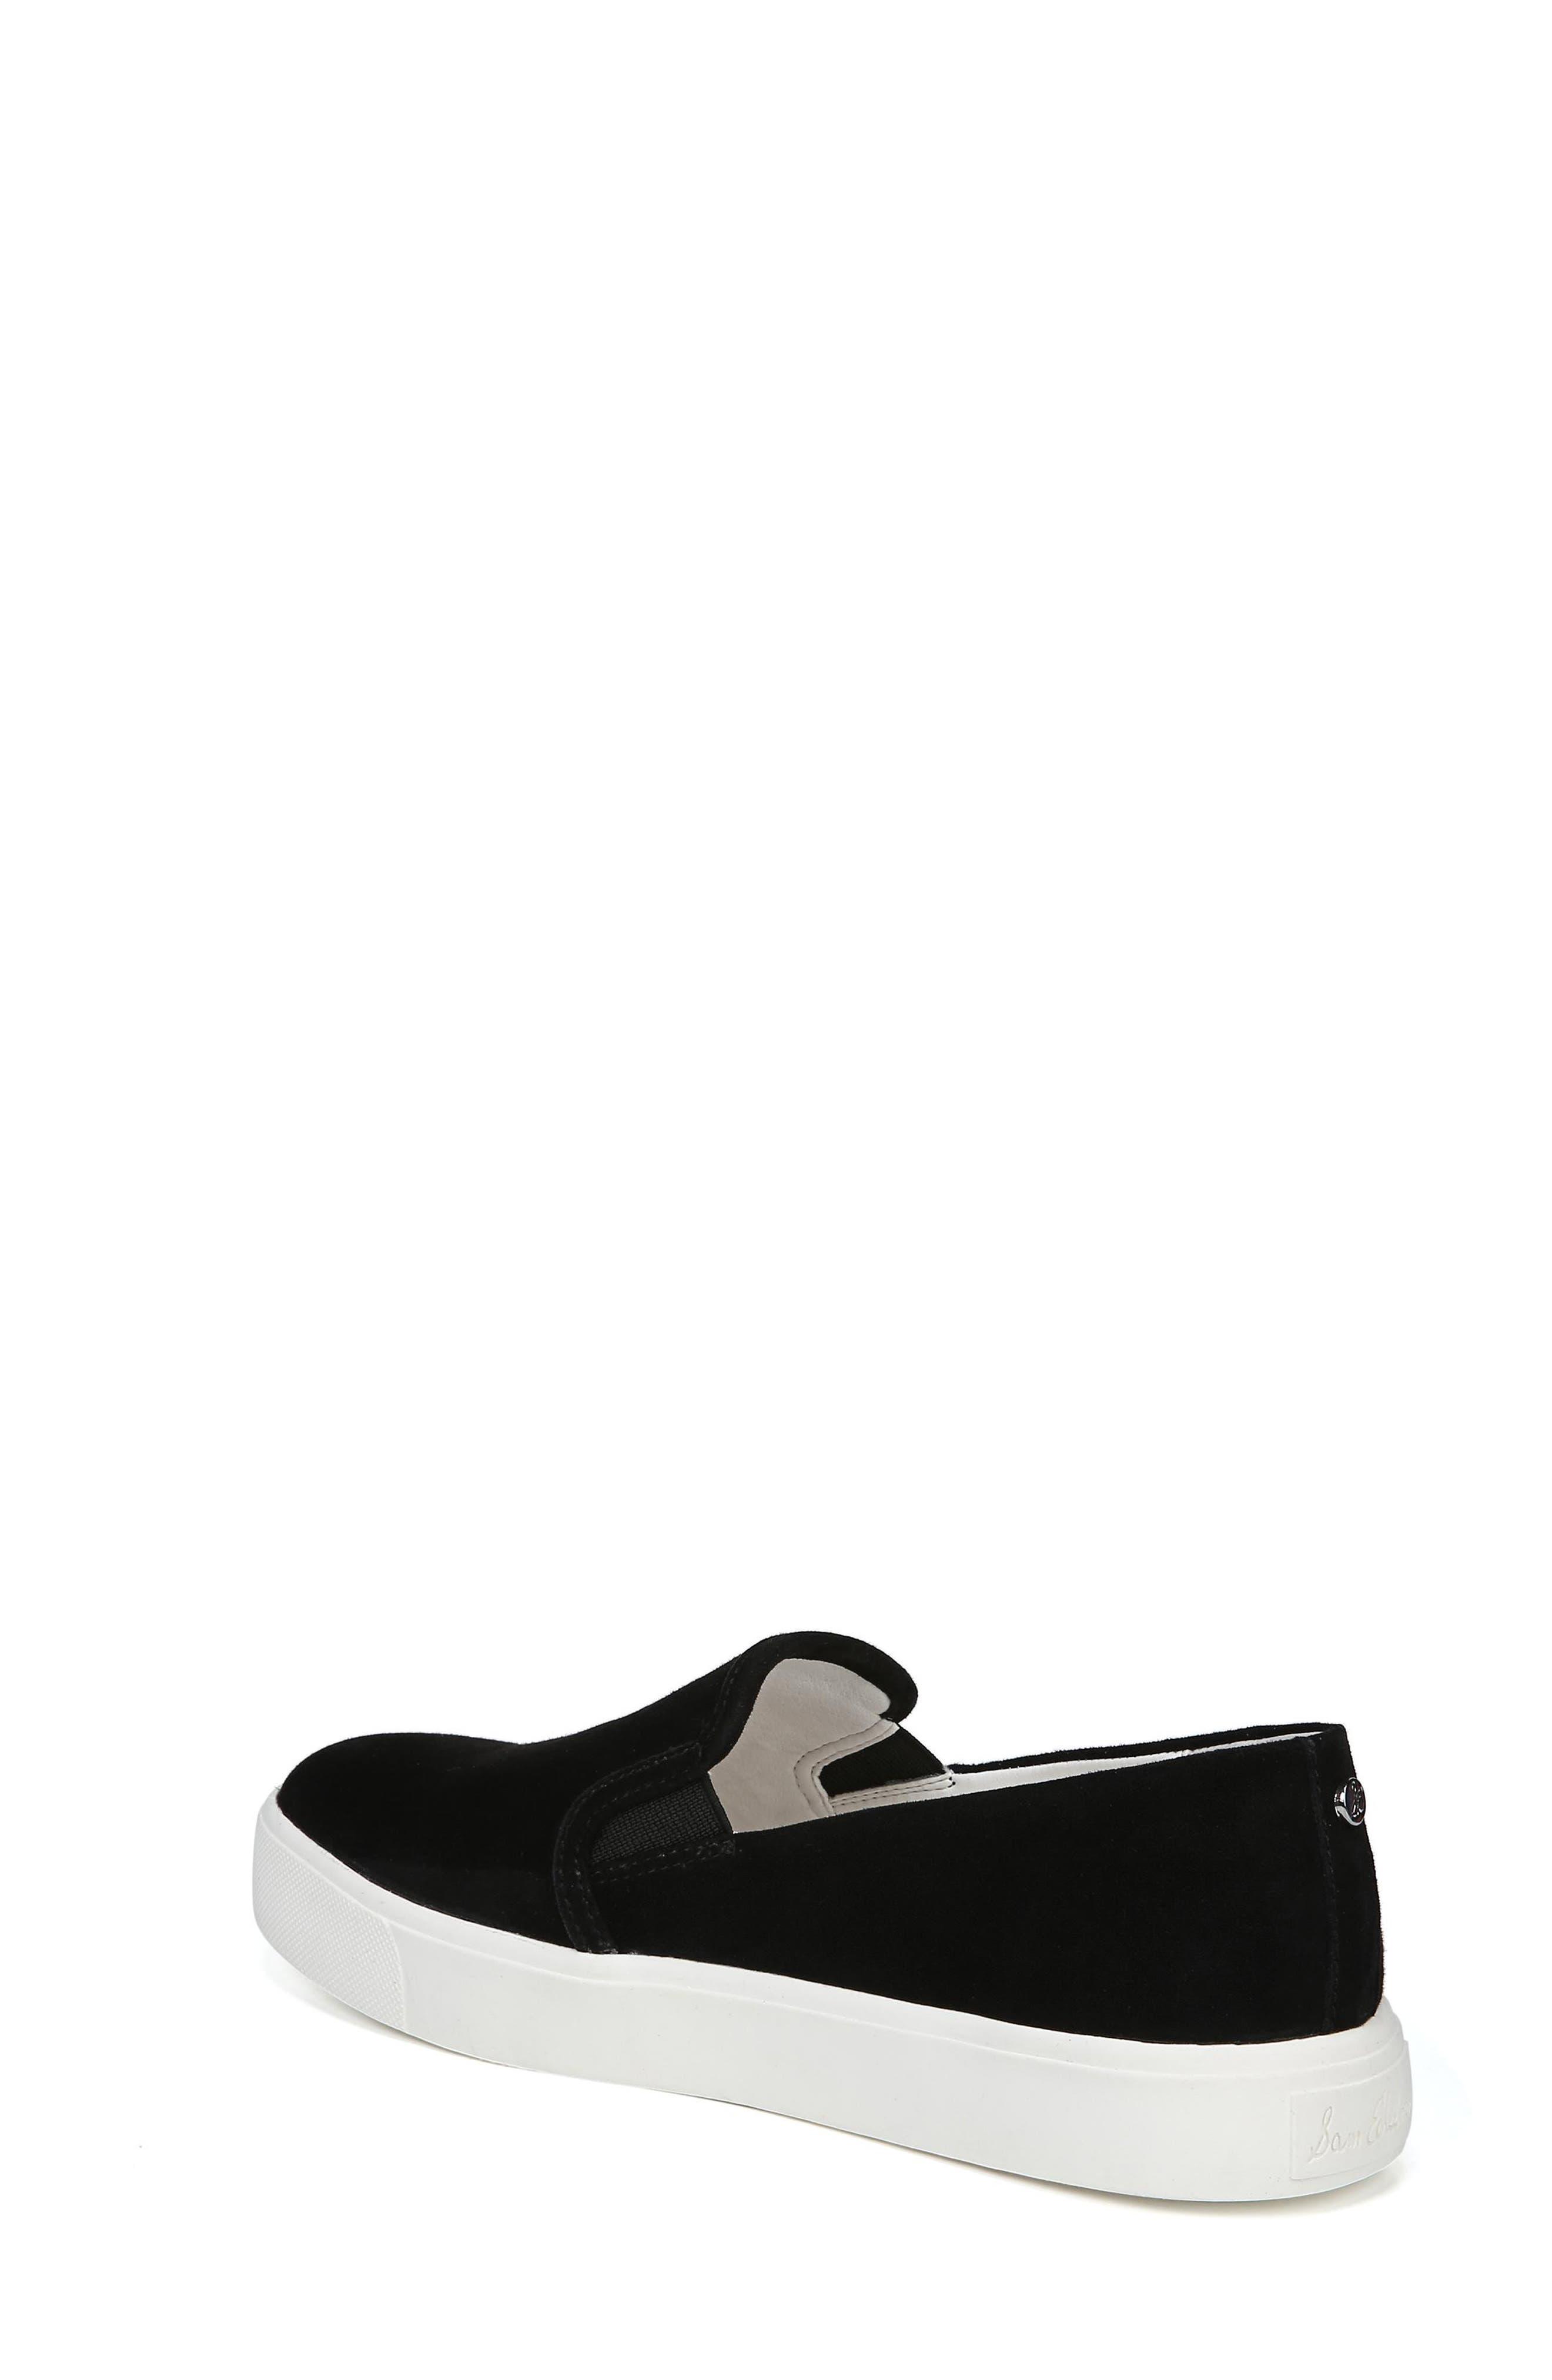 Elton Slip-On Sneaker,                             Alternate thumbnail 2, color,                             BLACK SUEDE LEATHER